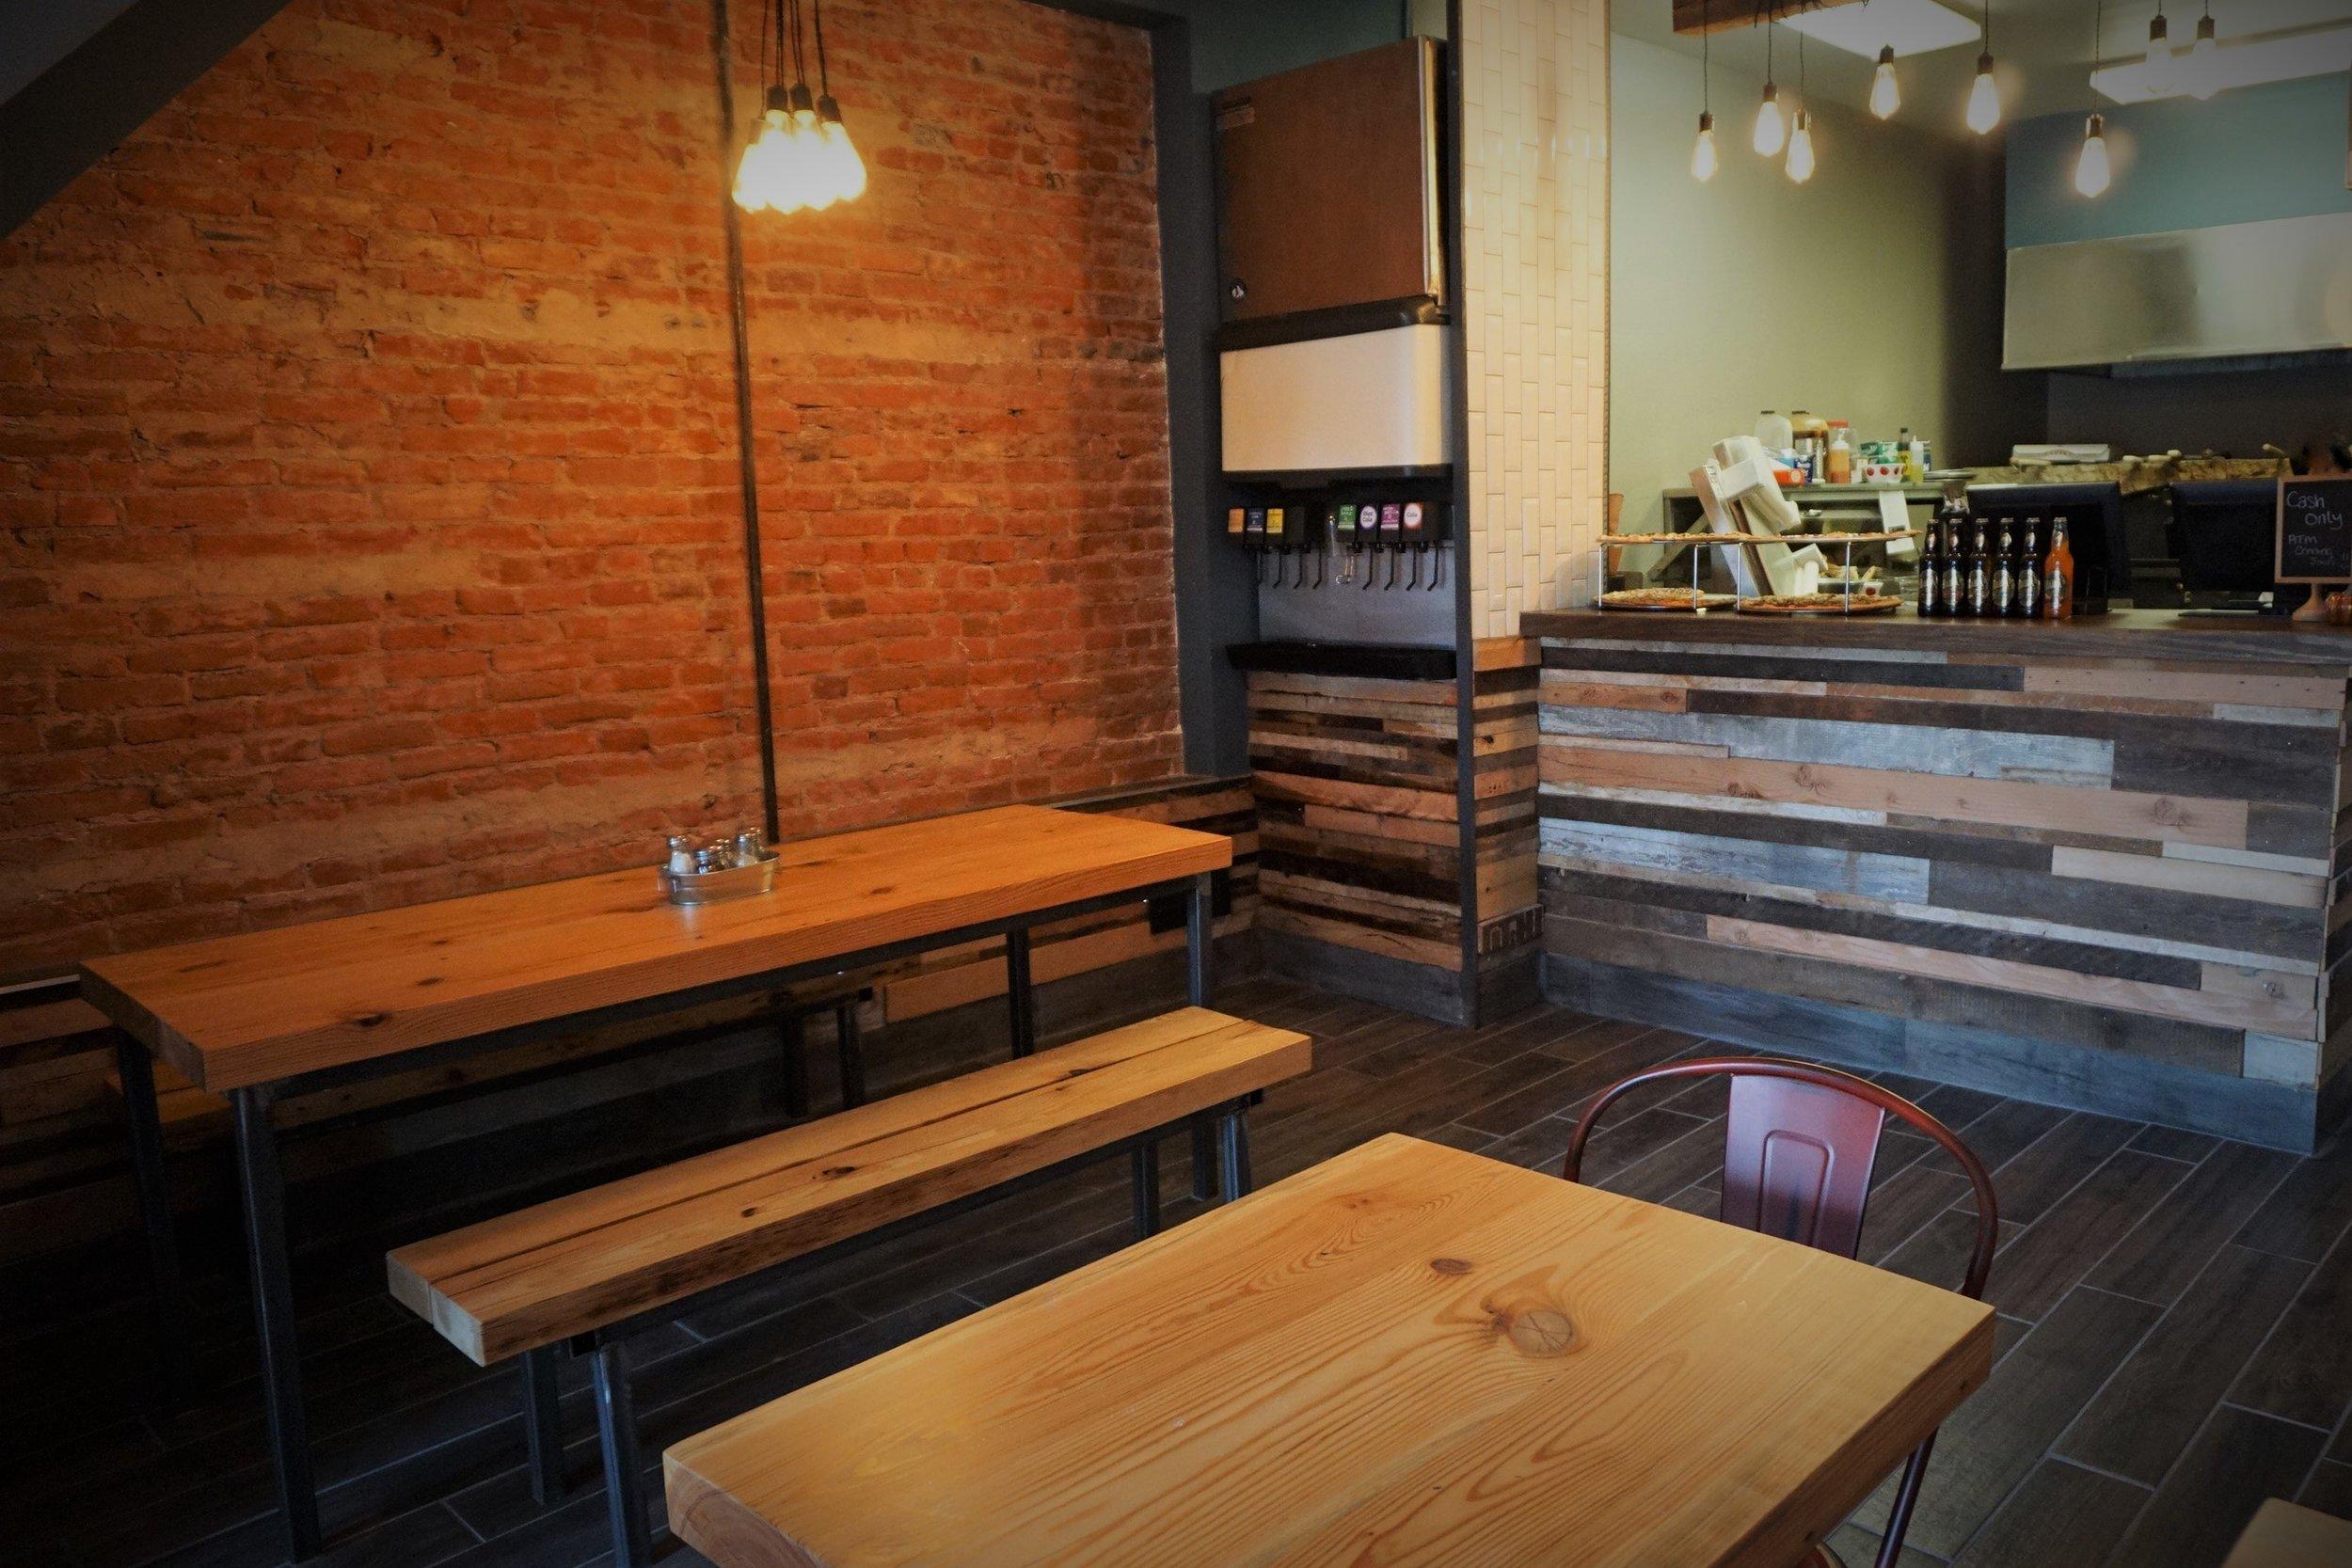 Slice, Slice Fishtown, Pizza, New Location, Grand Opening, Donuts, Organic, Menu Additions